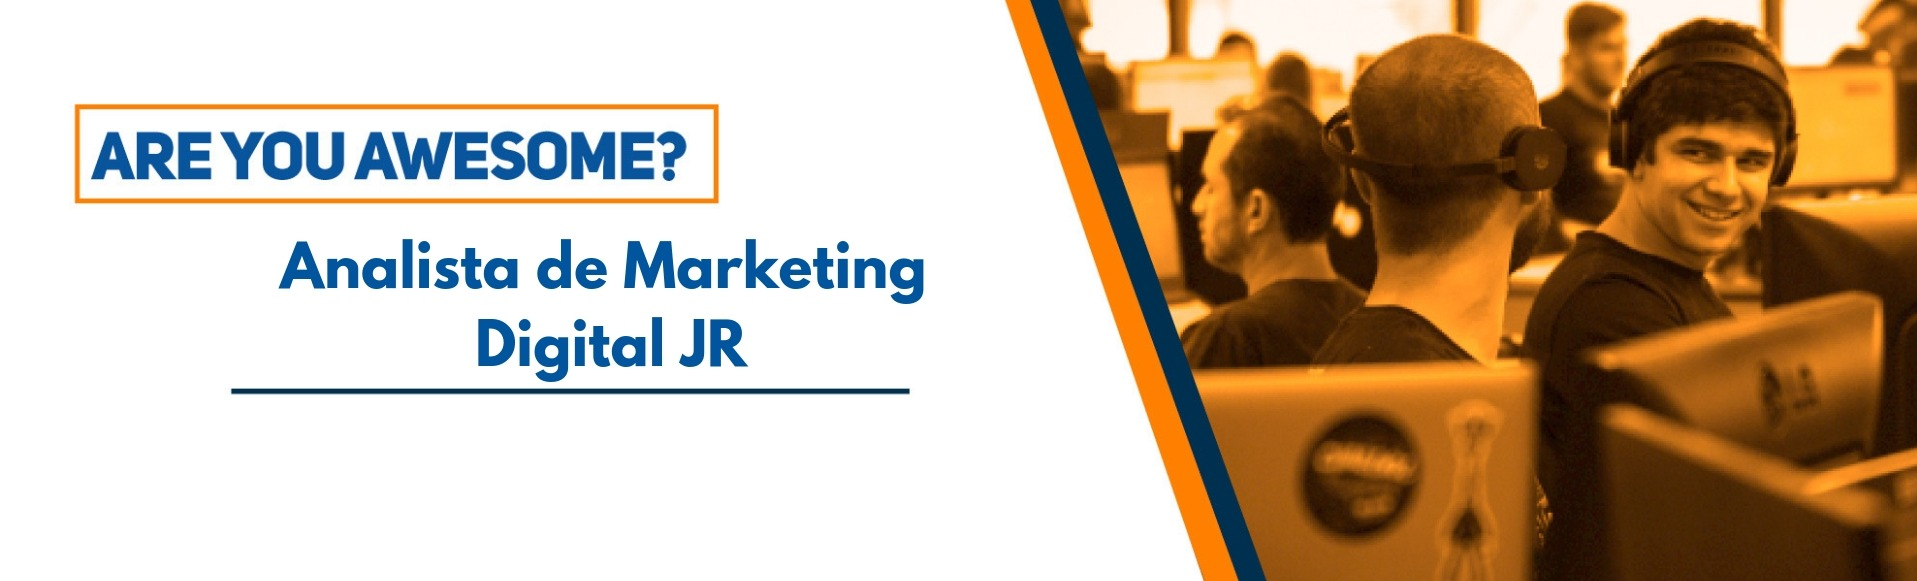 Analista de Marketing Digital JR